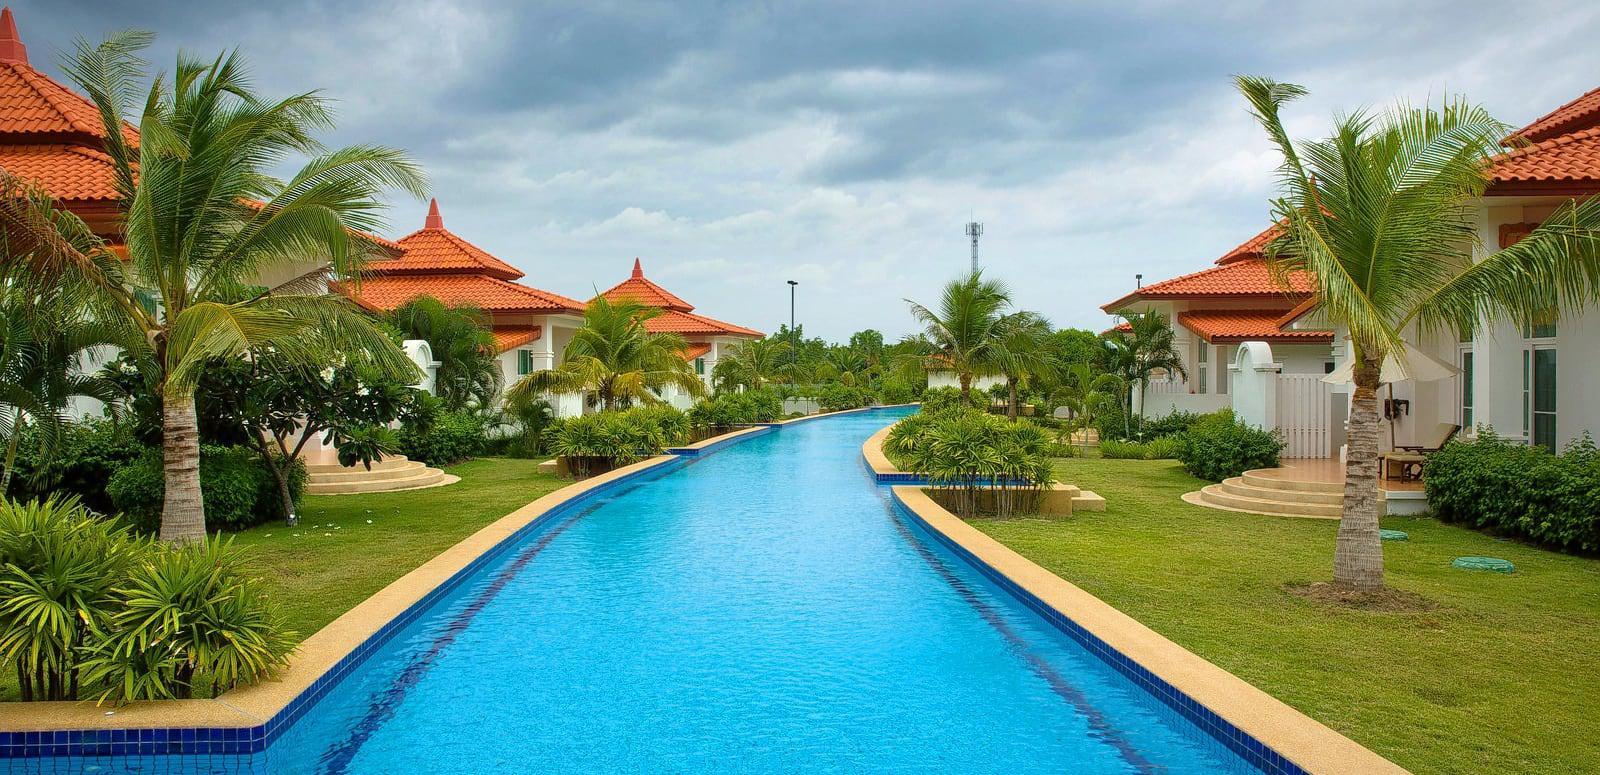 Adventure Resorts near Mumbai: Your Ticket to an Exhilarating Weekend